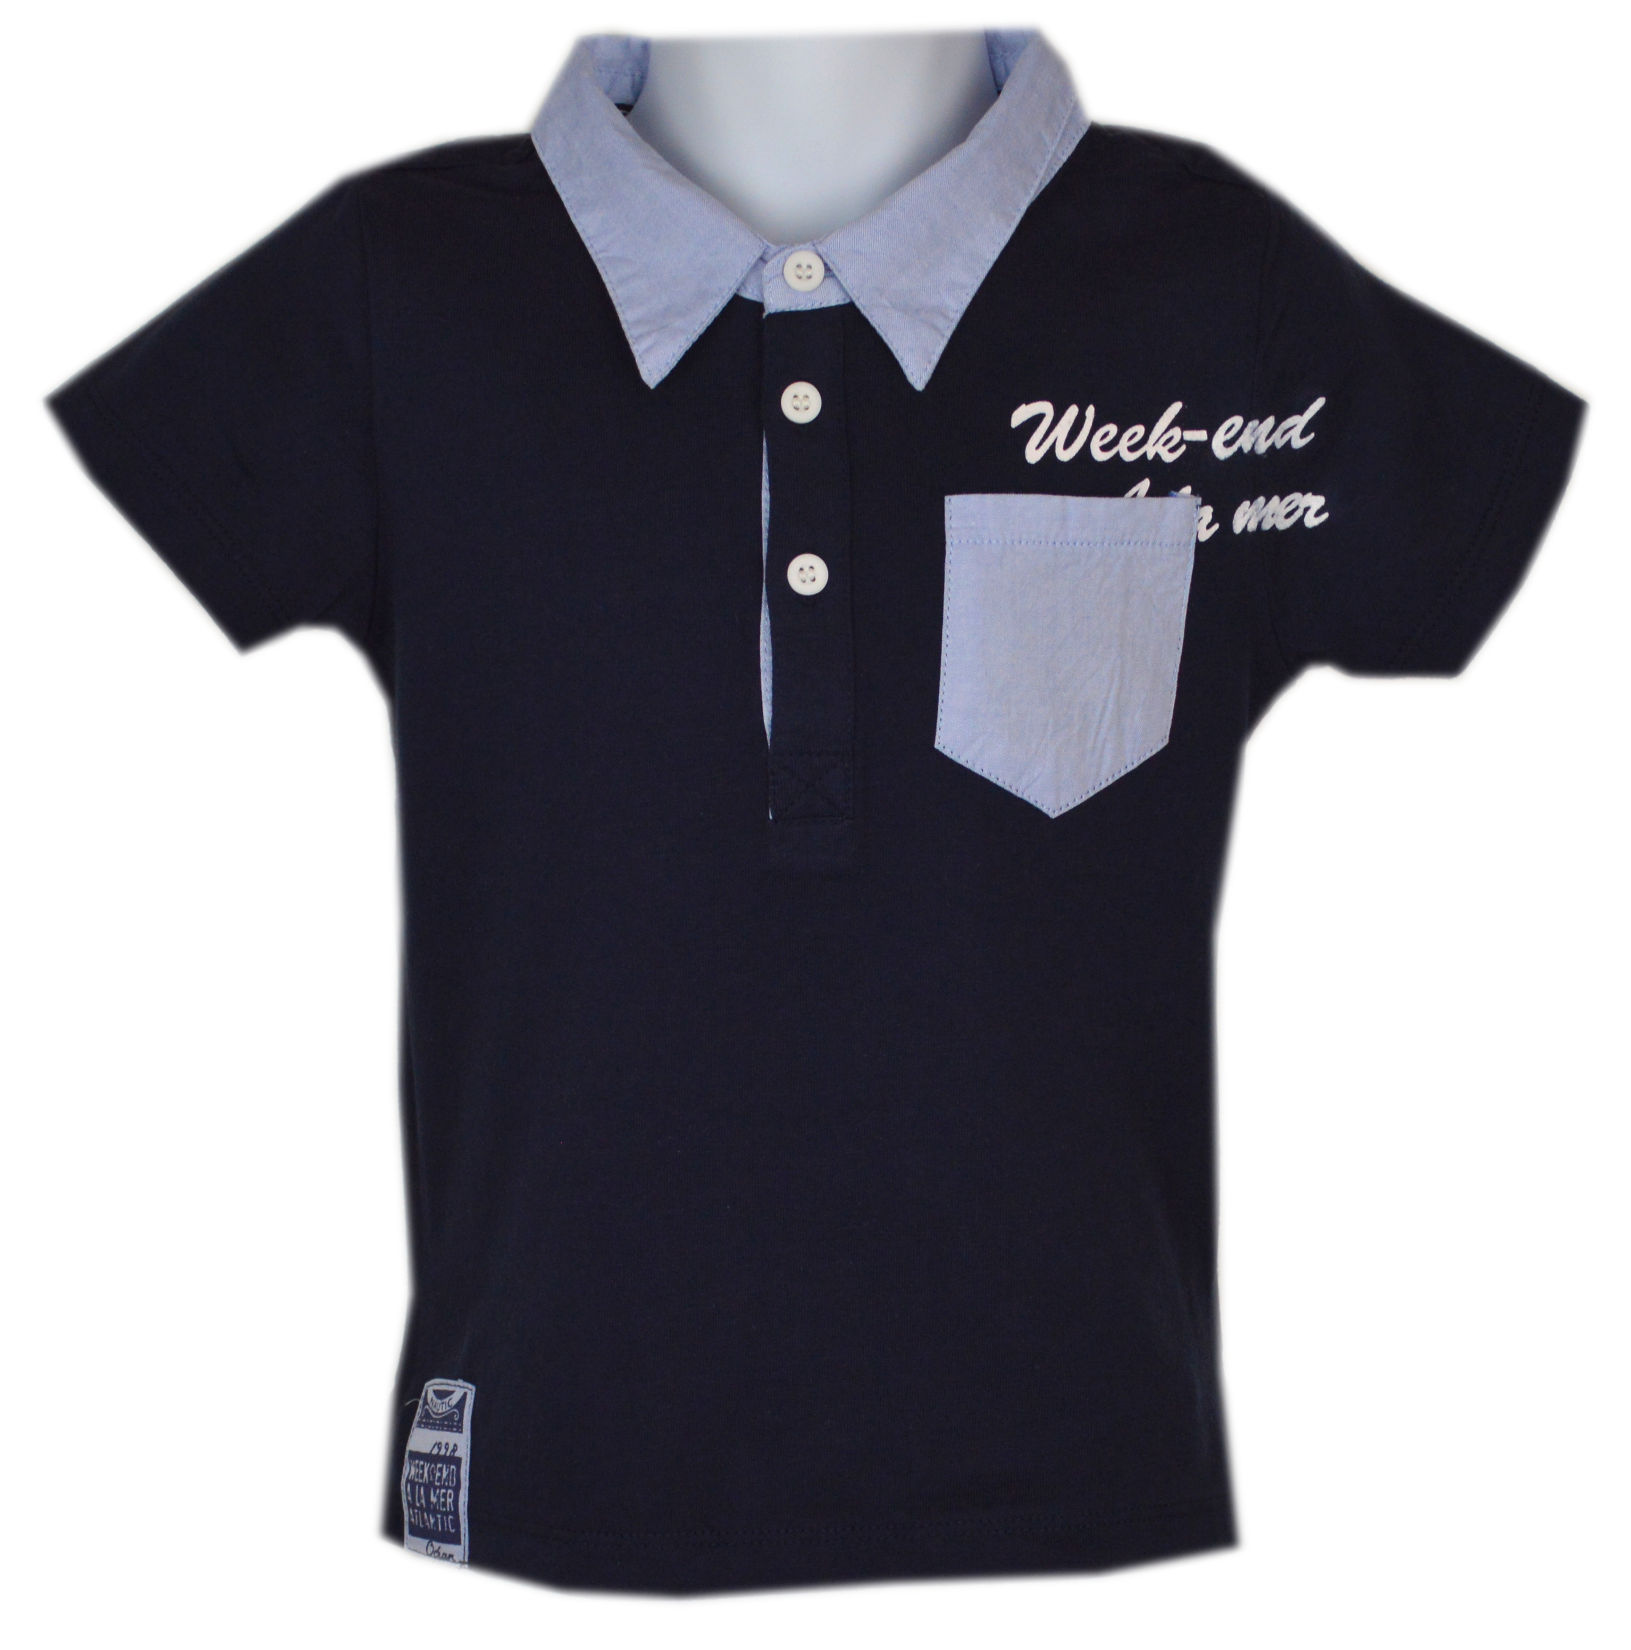 week end a la mer mode f r jungen polo shirt berlioz in navy. Black Bedroom Furniture Sets. Home Design Ideas